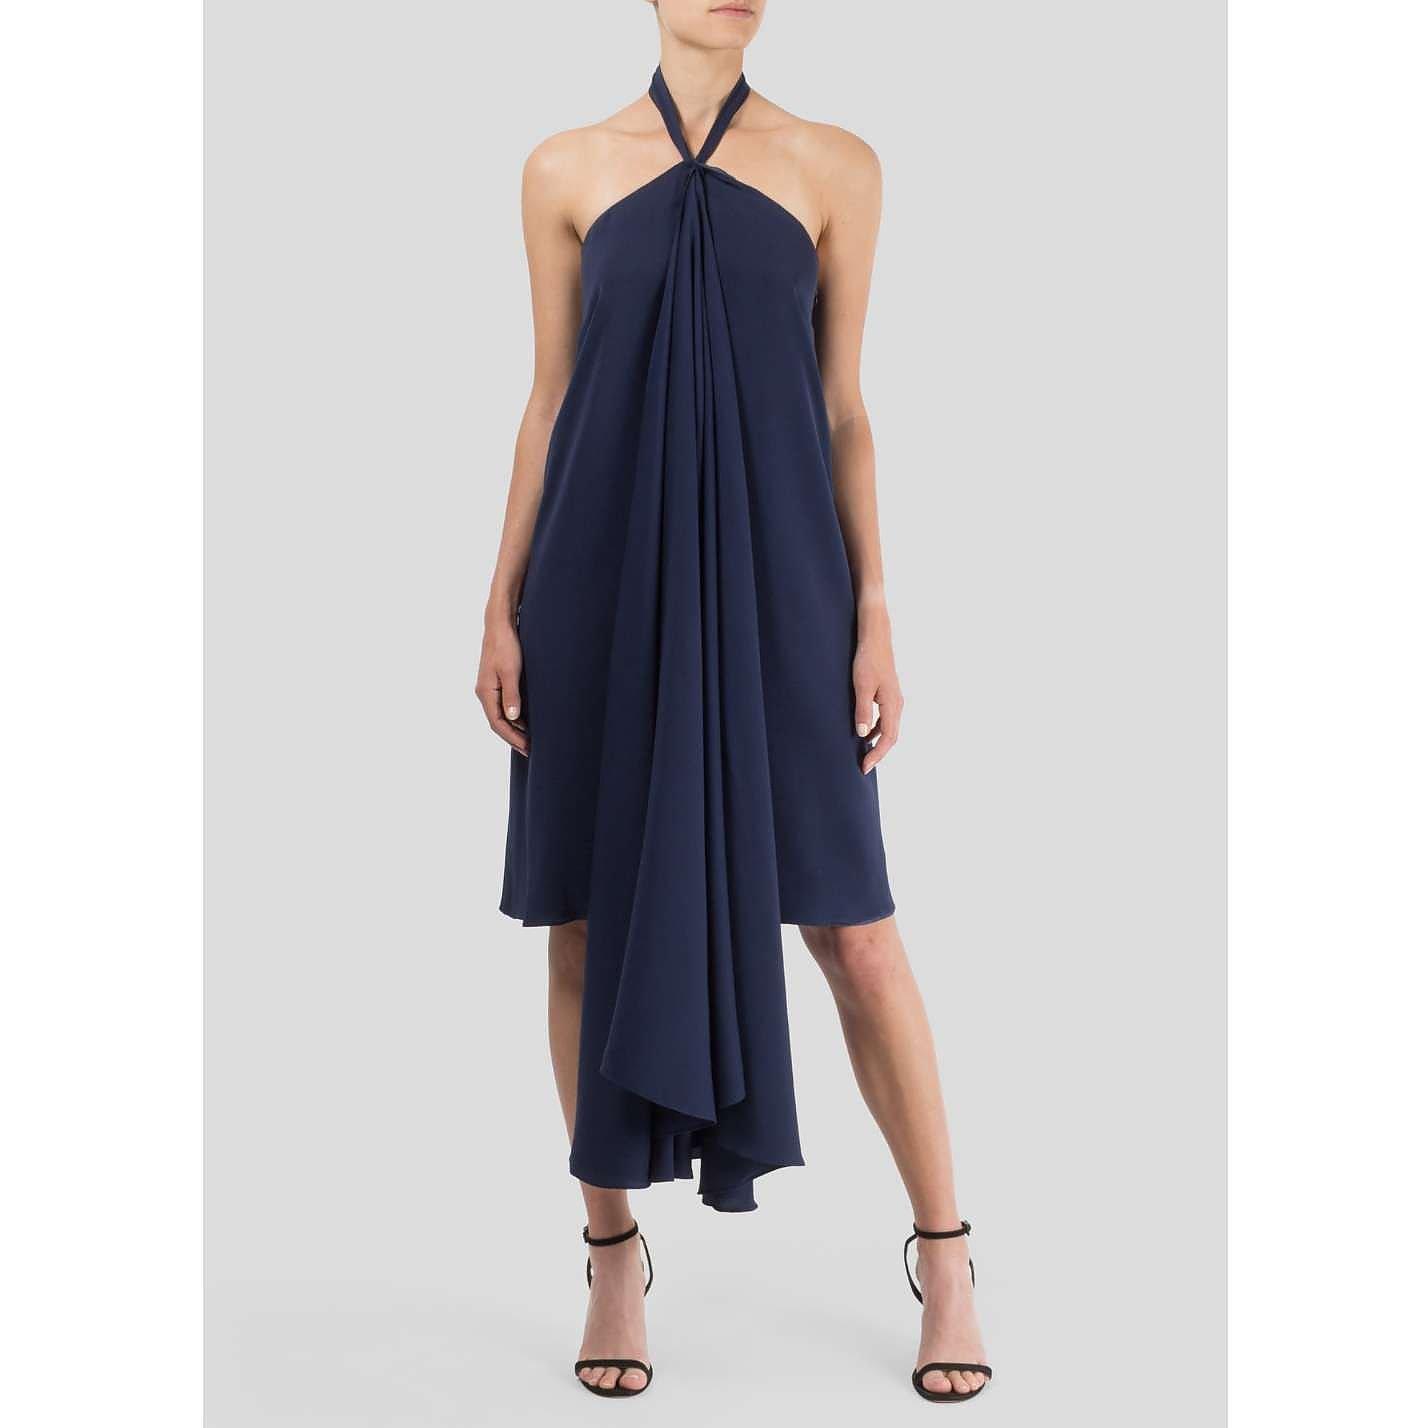 Jil Sander Drape-Front Dress